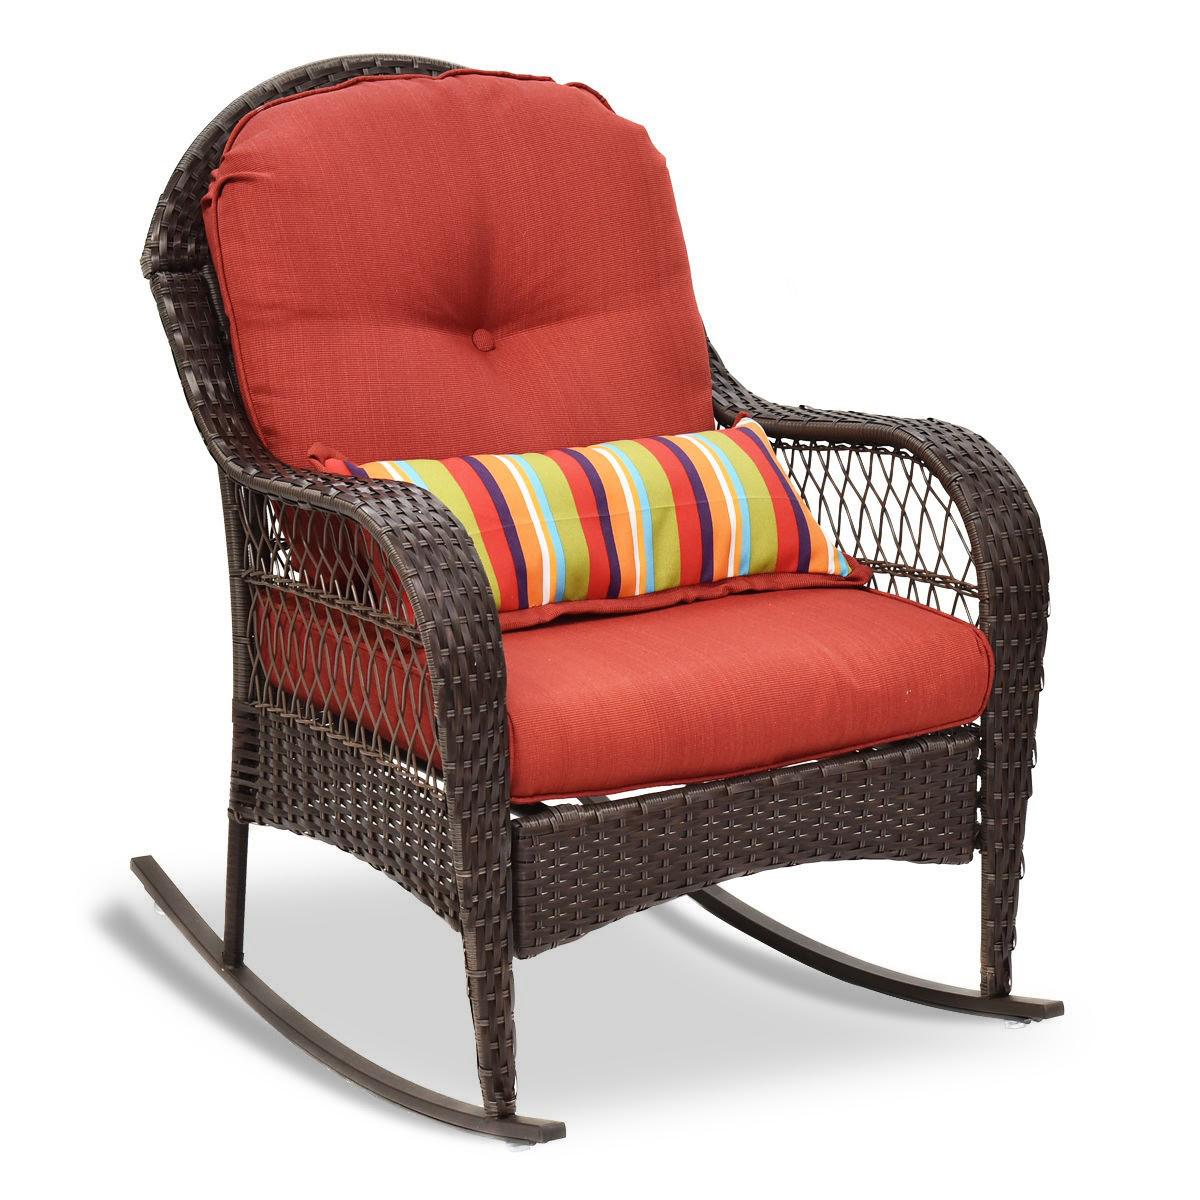 Outdoor Wicker Adirondack Chair W Seat Cushion